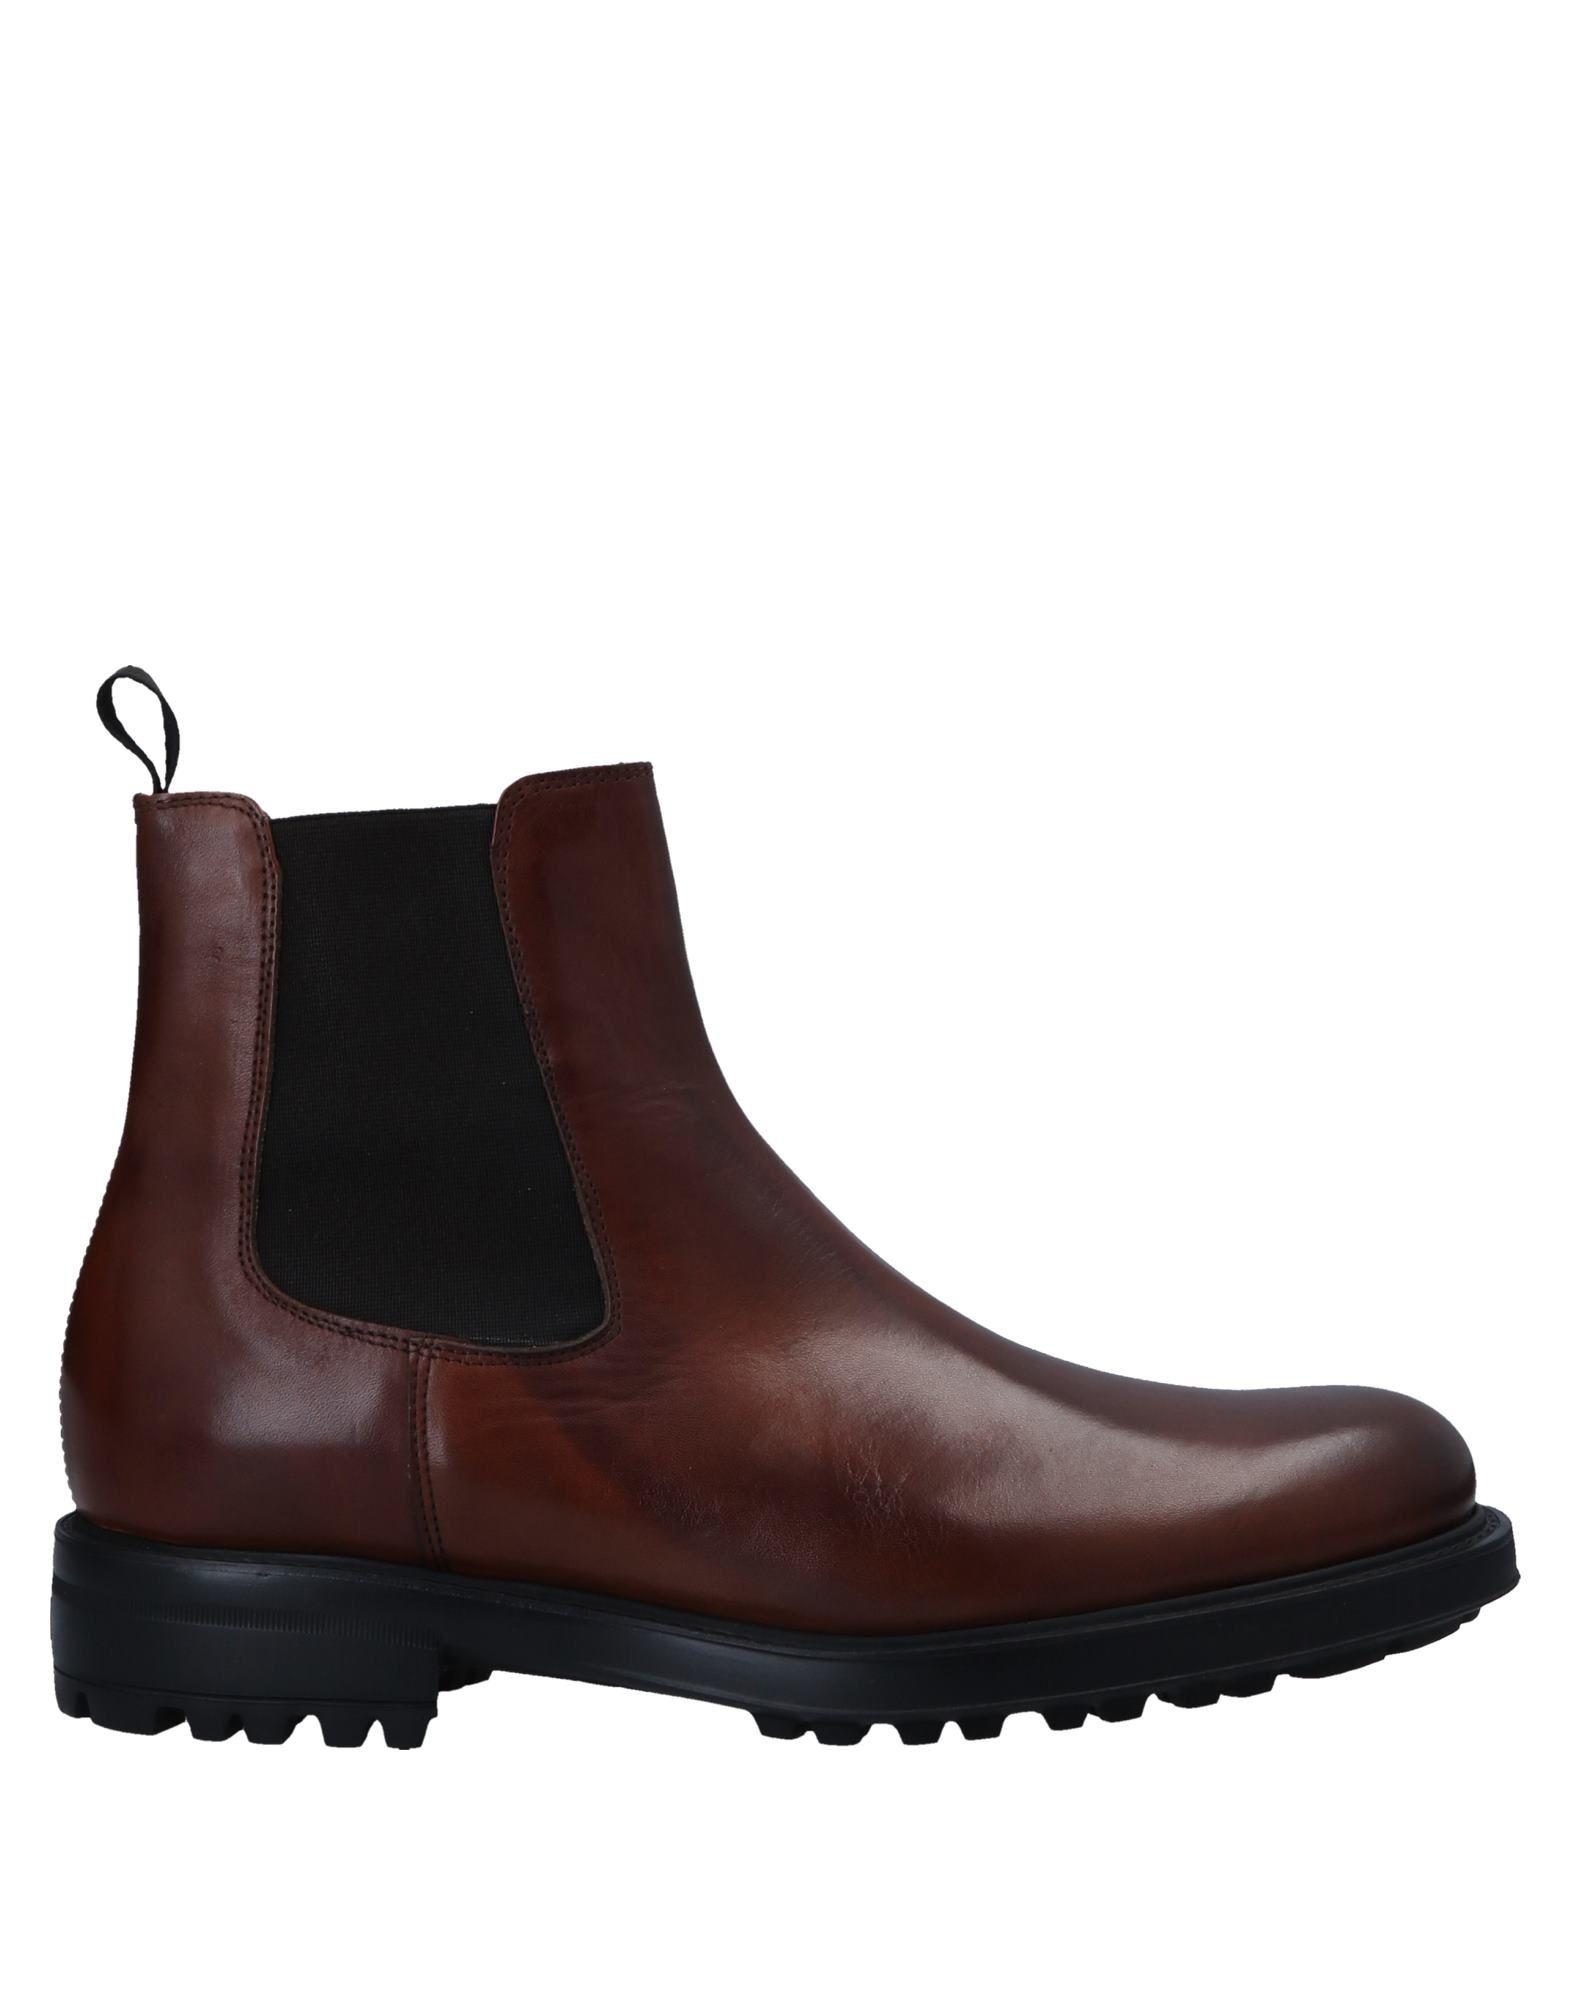 BALDININI Полусапоги и высокие ботинки мокасины baldinini baldinini ba097awzyg29